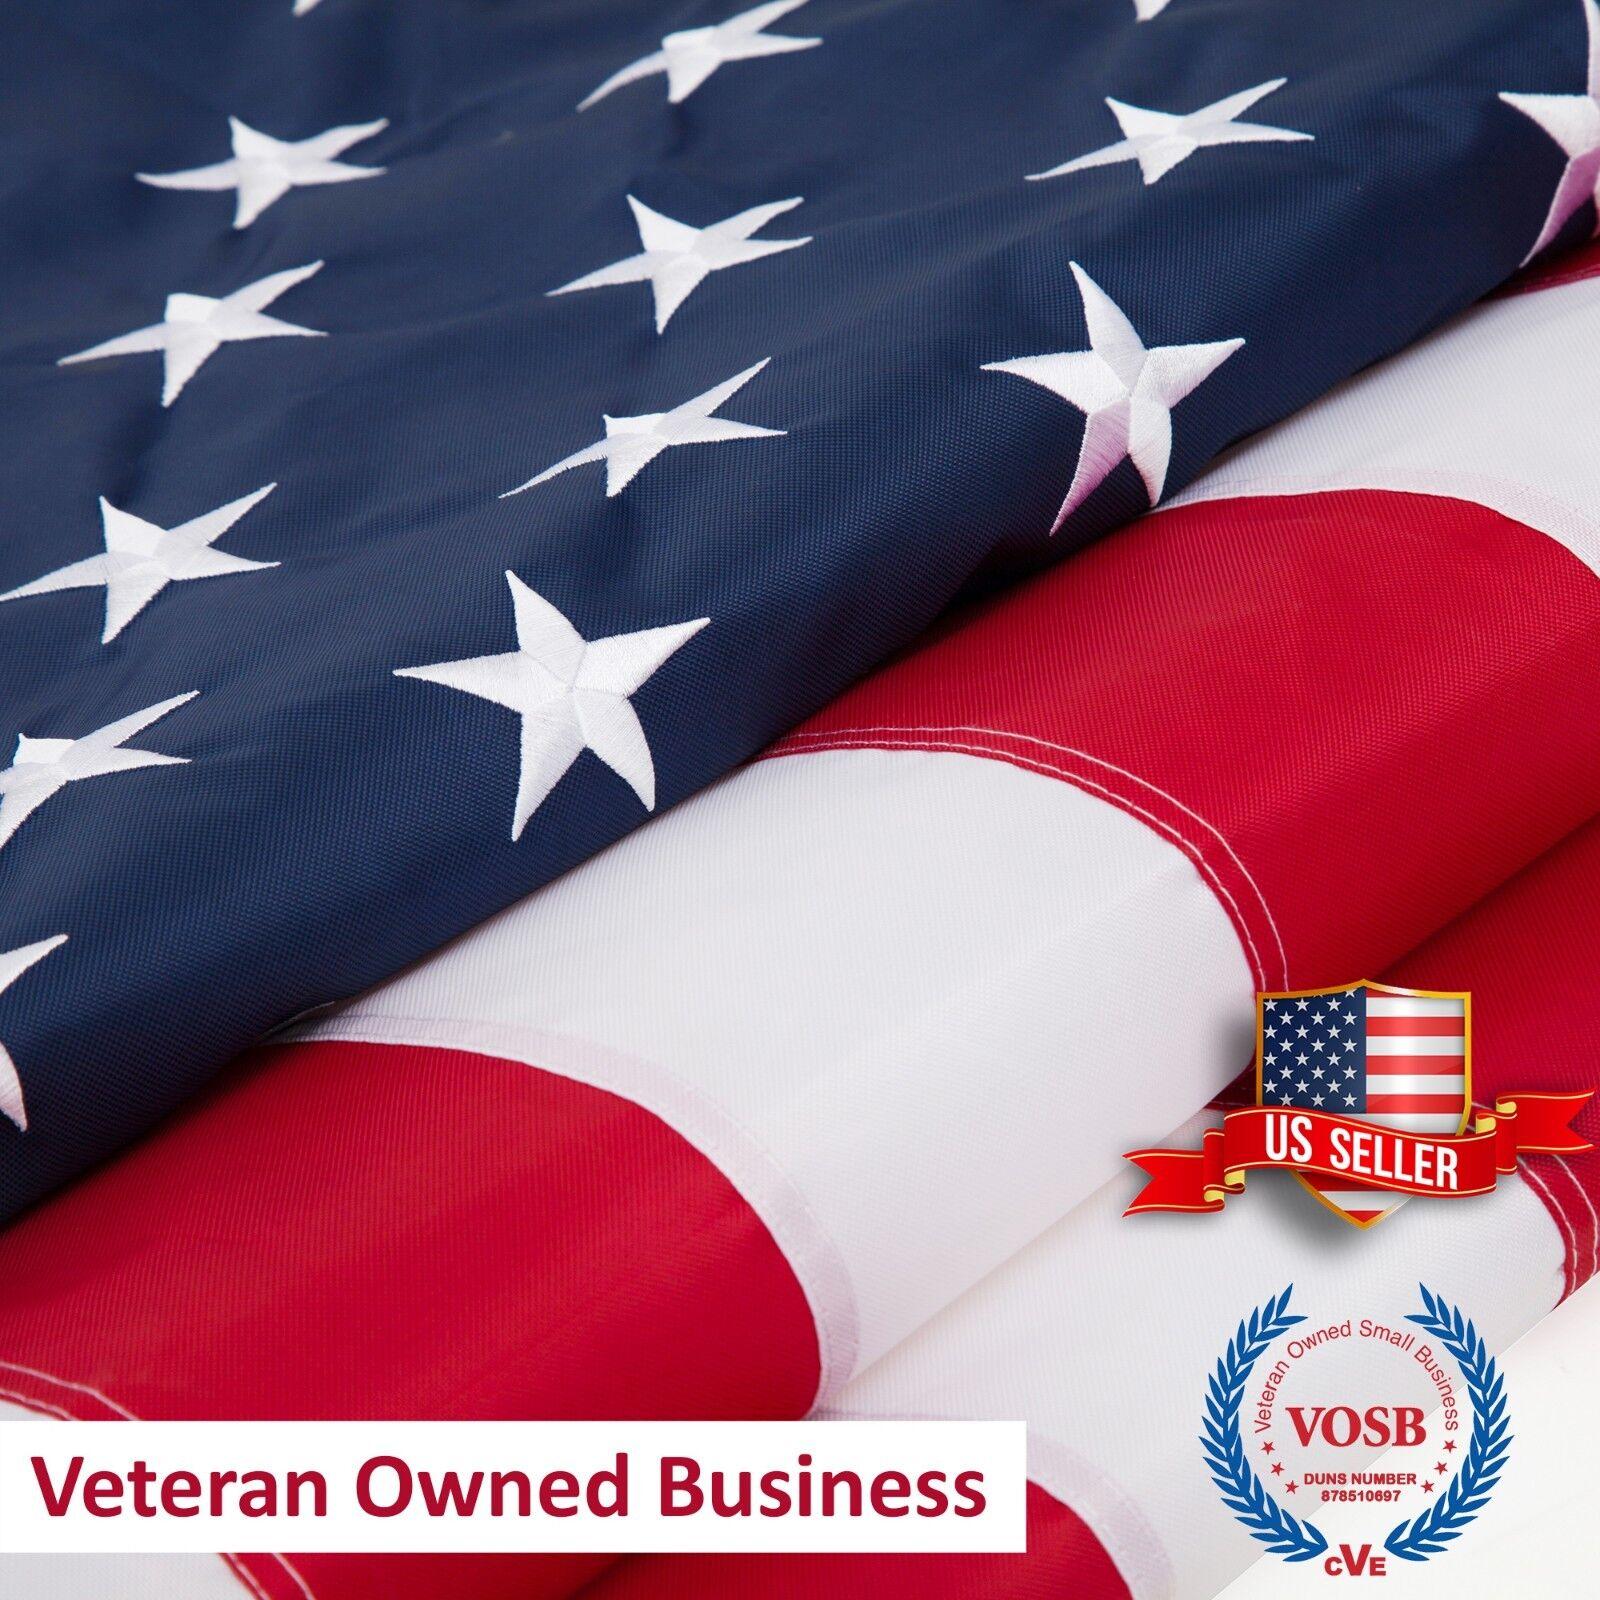 2x3 3x5 4x6 5x8 6x10 8x12 10x15 American Flag US Embroidered